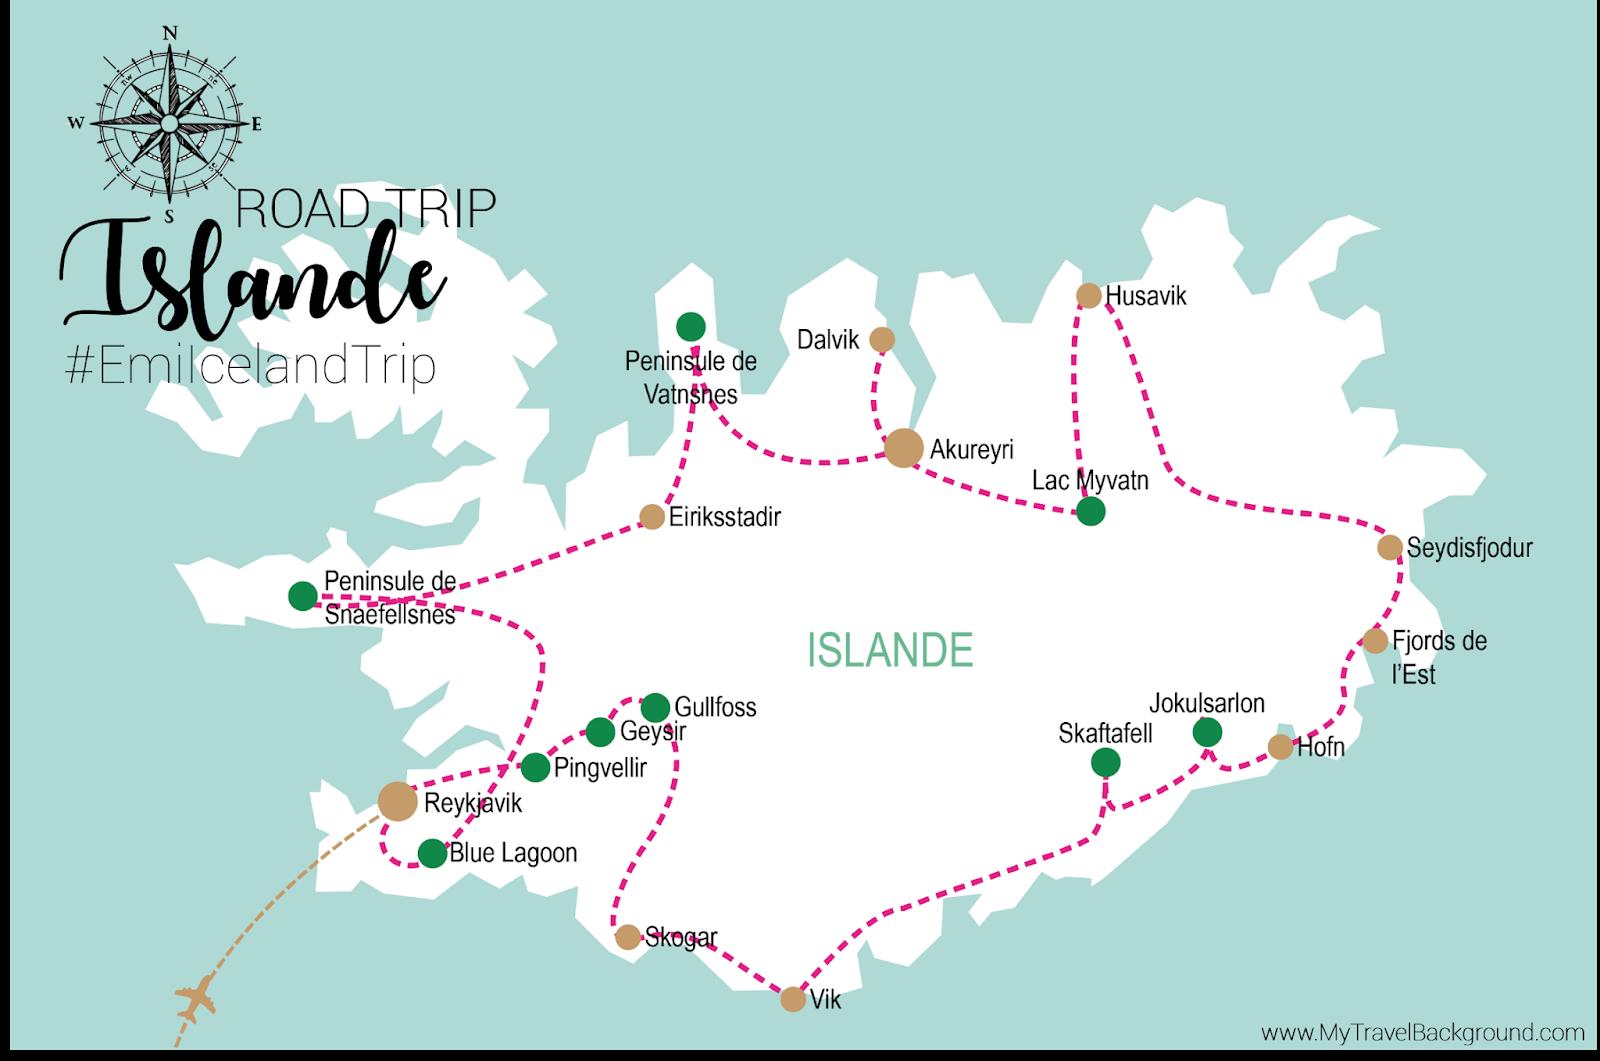 My Travel Background : mon road trip en Islande - Itinéraire